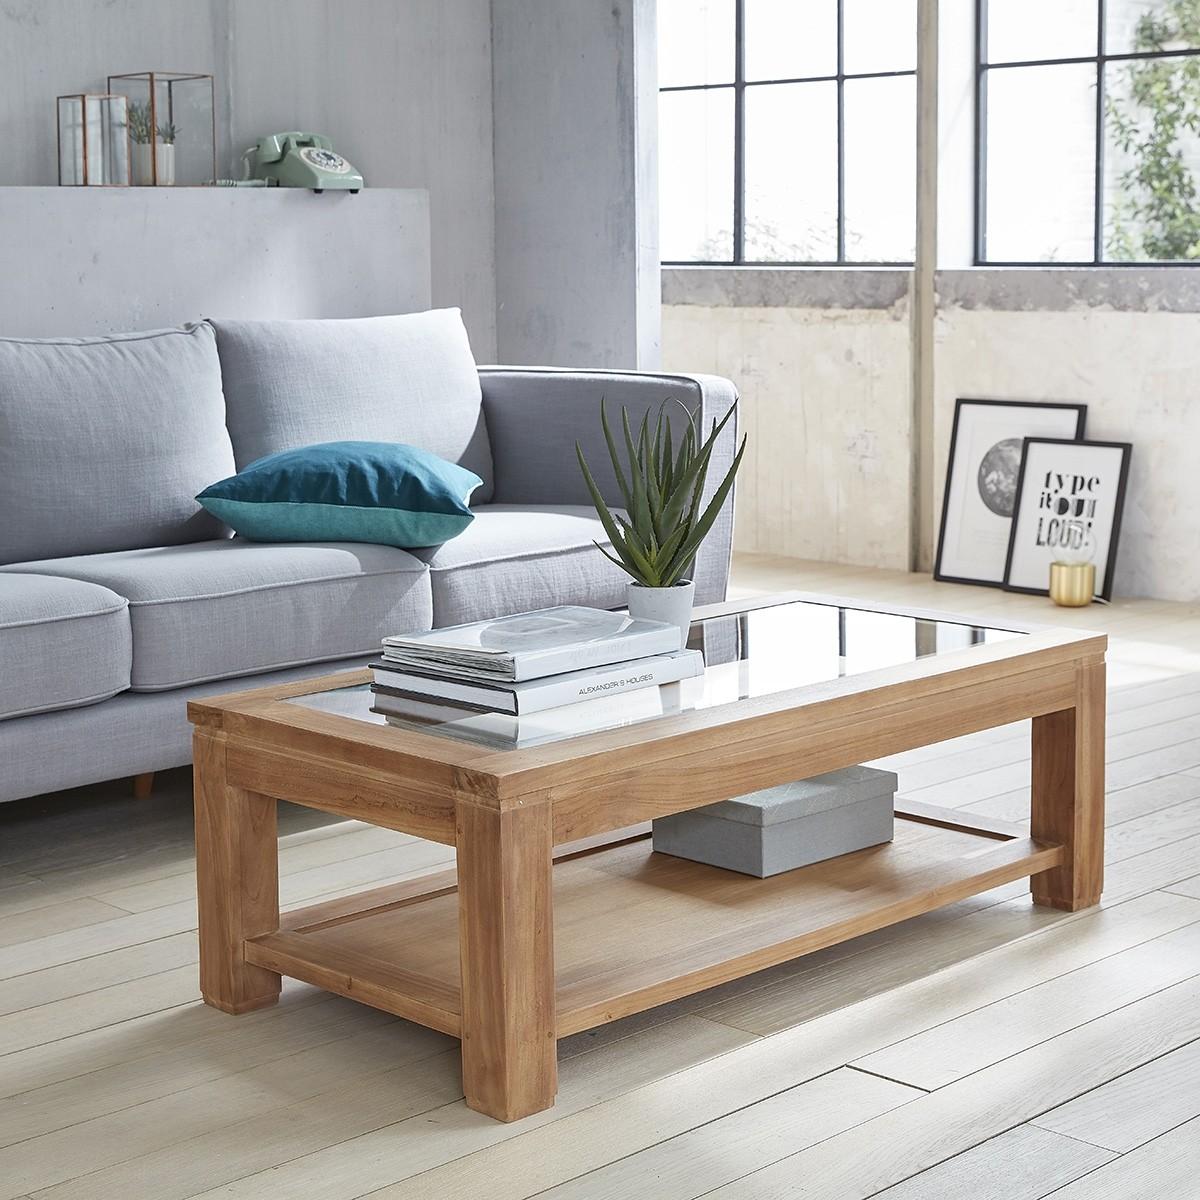 table basse rectangulaire vitree en teck brut 120 boston